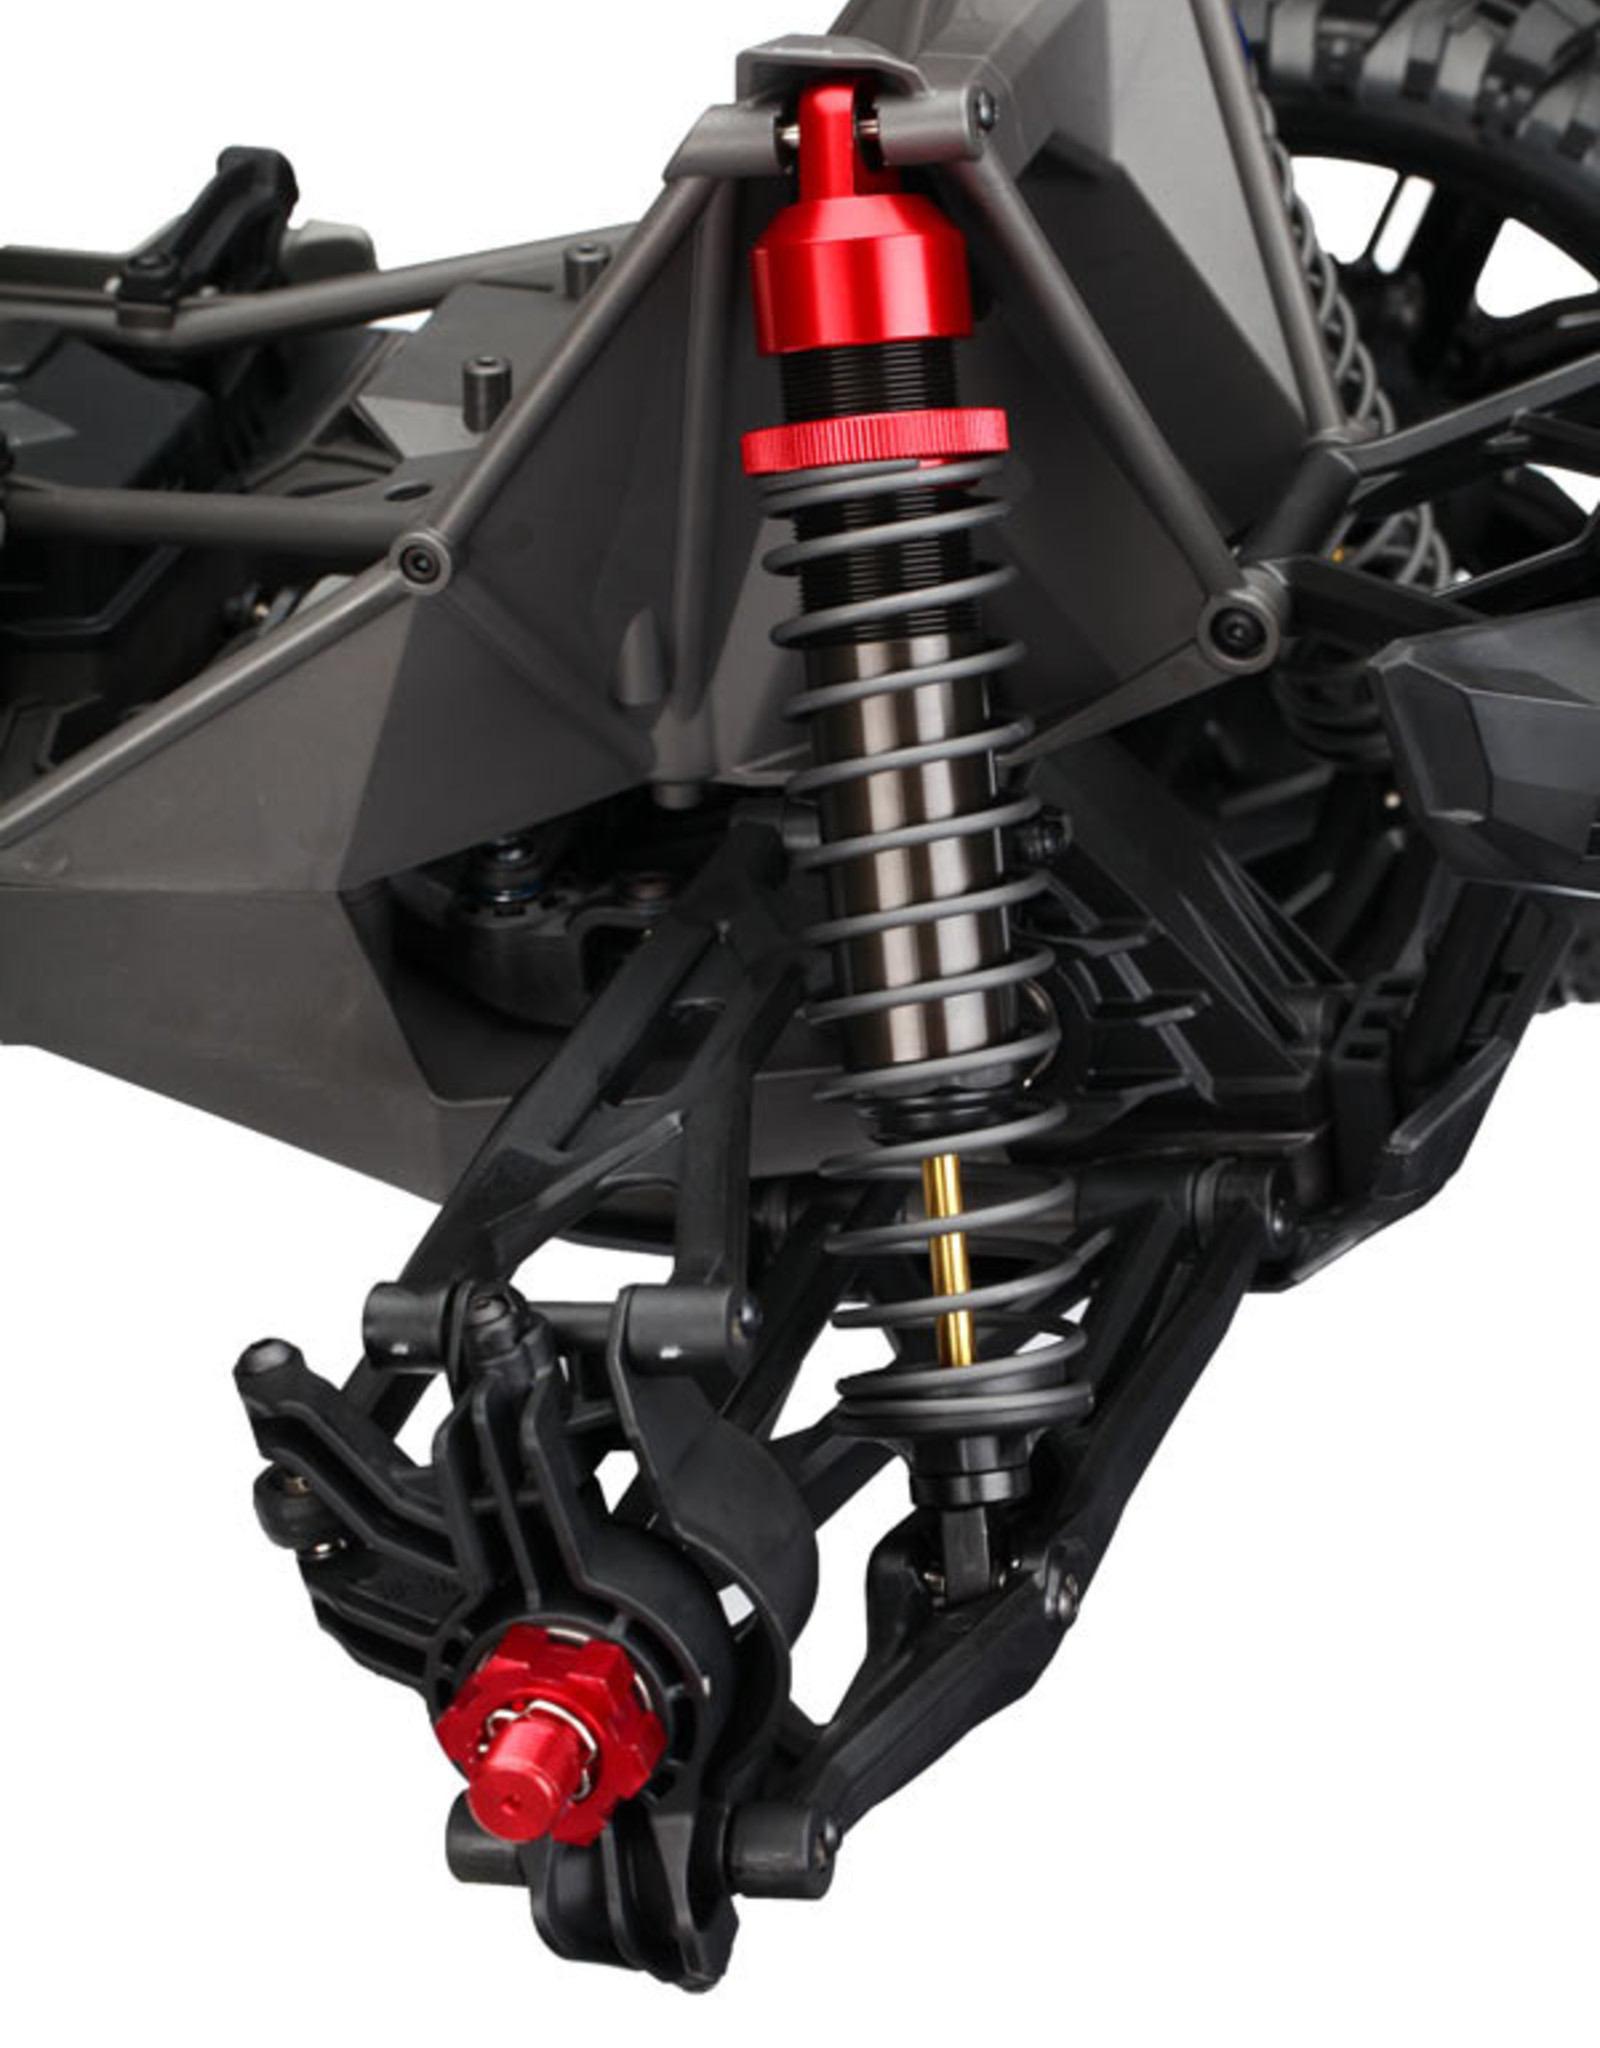 Traxxas Traxxas X-maxx Shock caps, aluminum (red-anodized), GTX shocks (4)/ spacers (8)